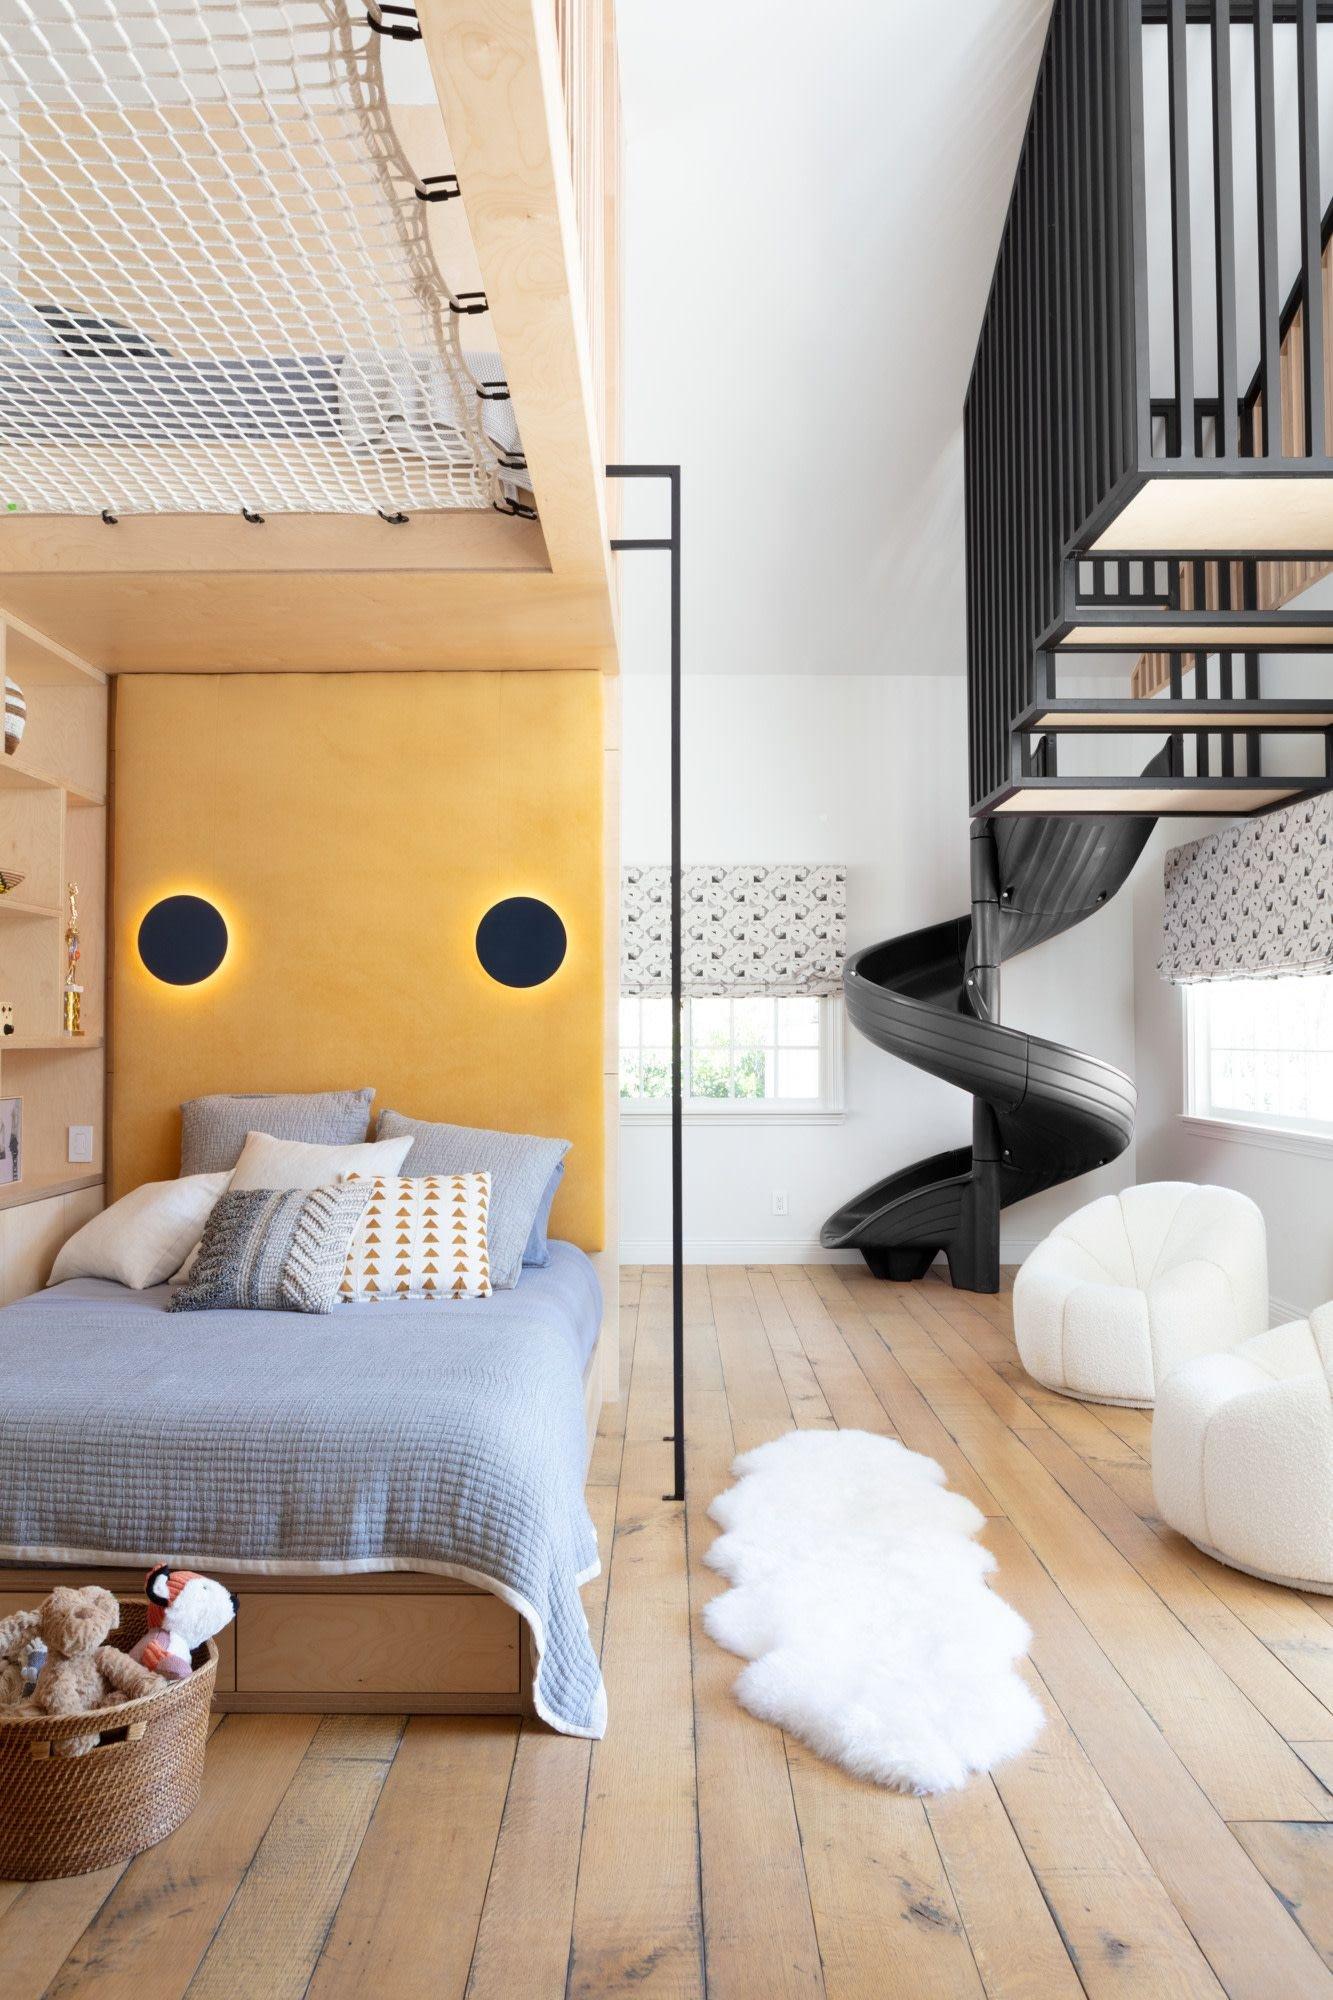 10 Year Old Boy Bedroom Ideas Elegant 55 Kids Room Design Ideas Cool Kids Bedroom Decor and Style